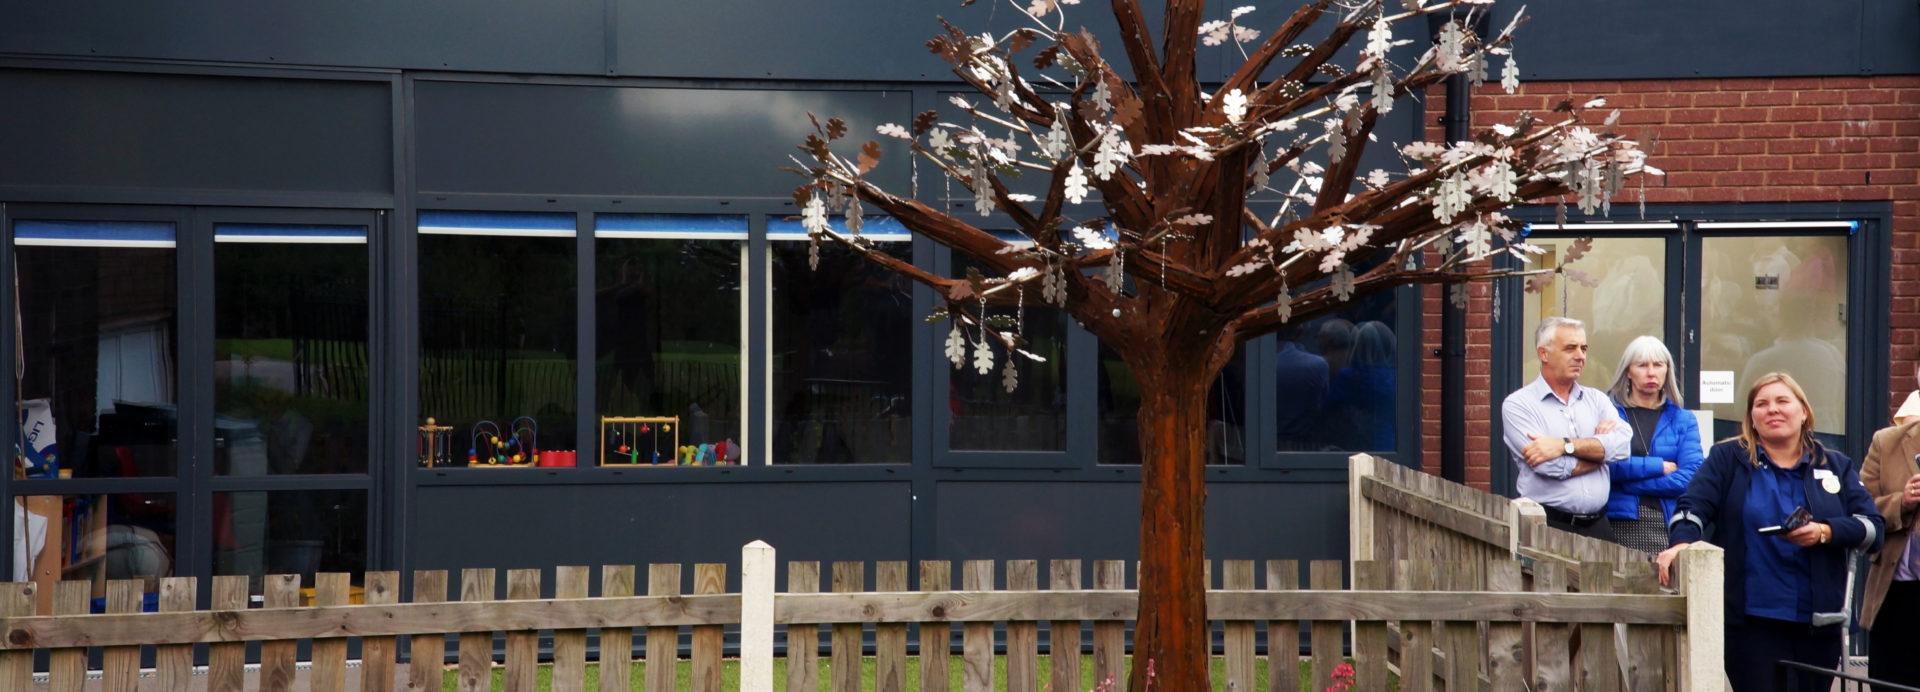 Memory tree unveiling